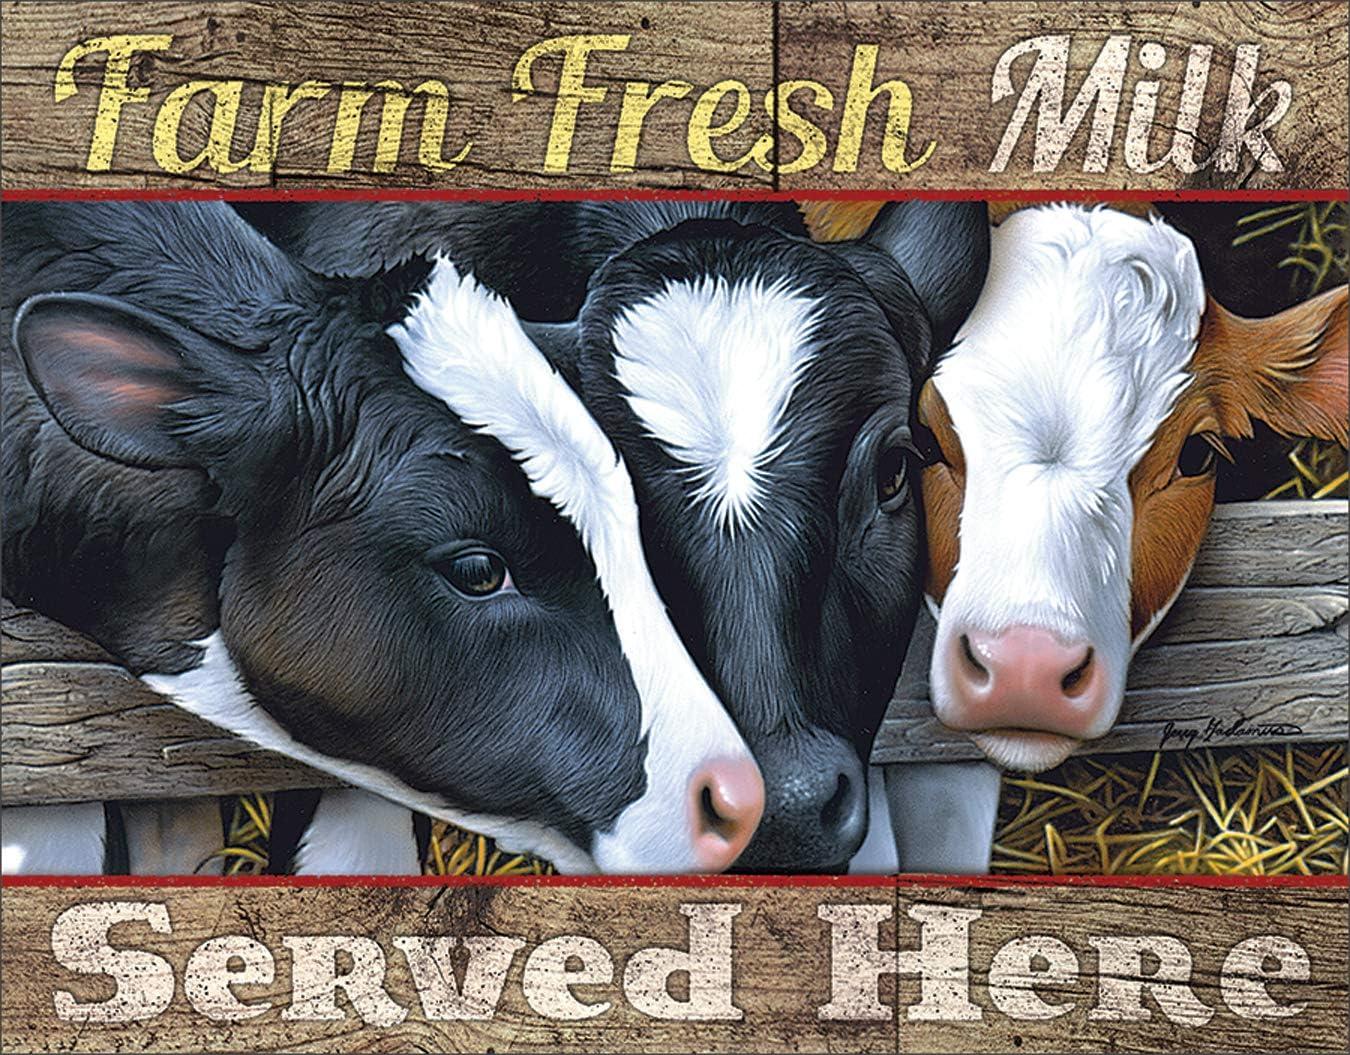 "Desperate Enterprises Farm Fresh Milk Tin Sign, 16"" W x 12.5"" H"